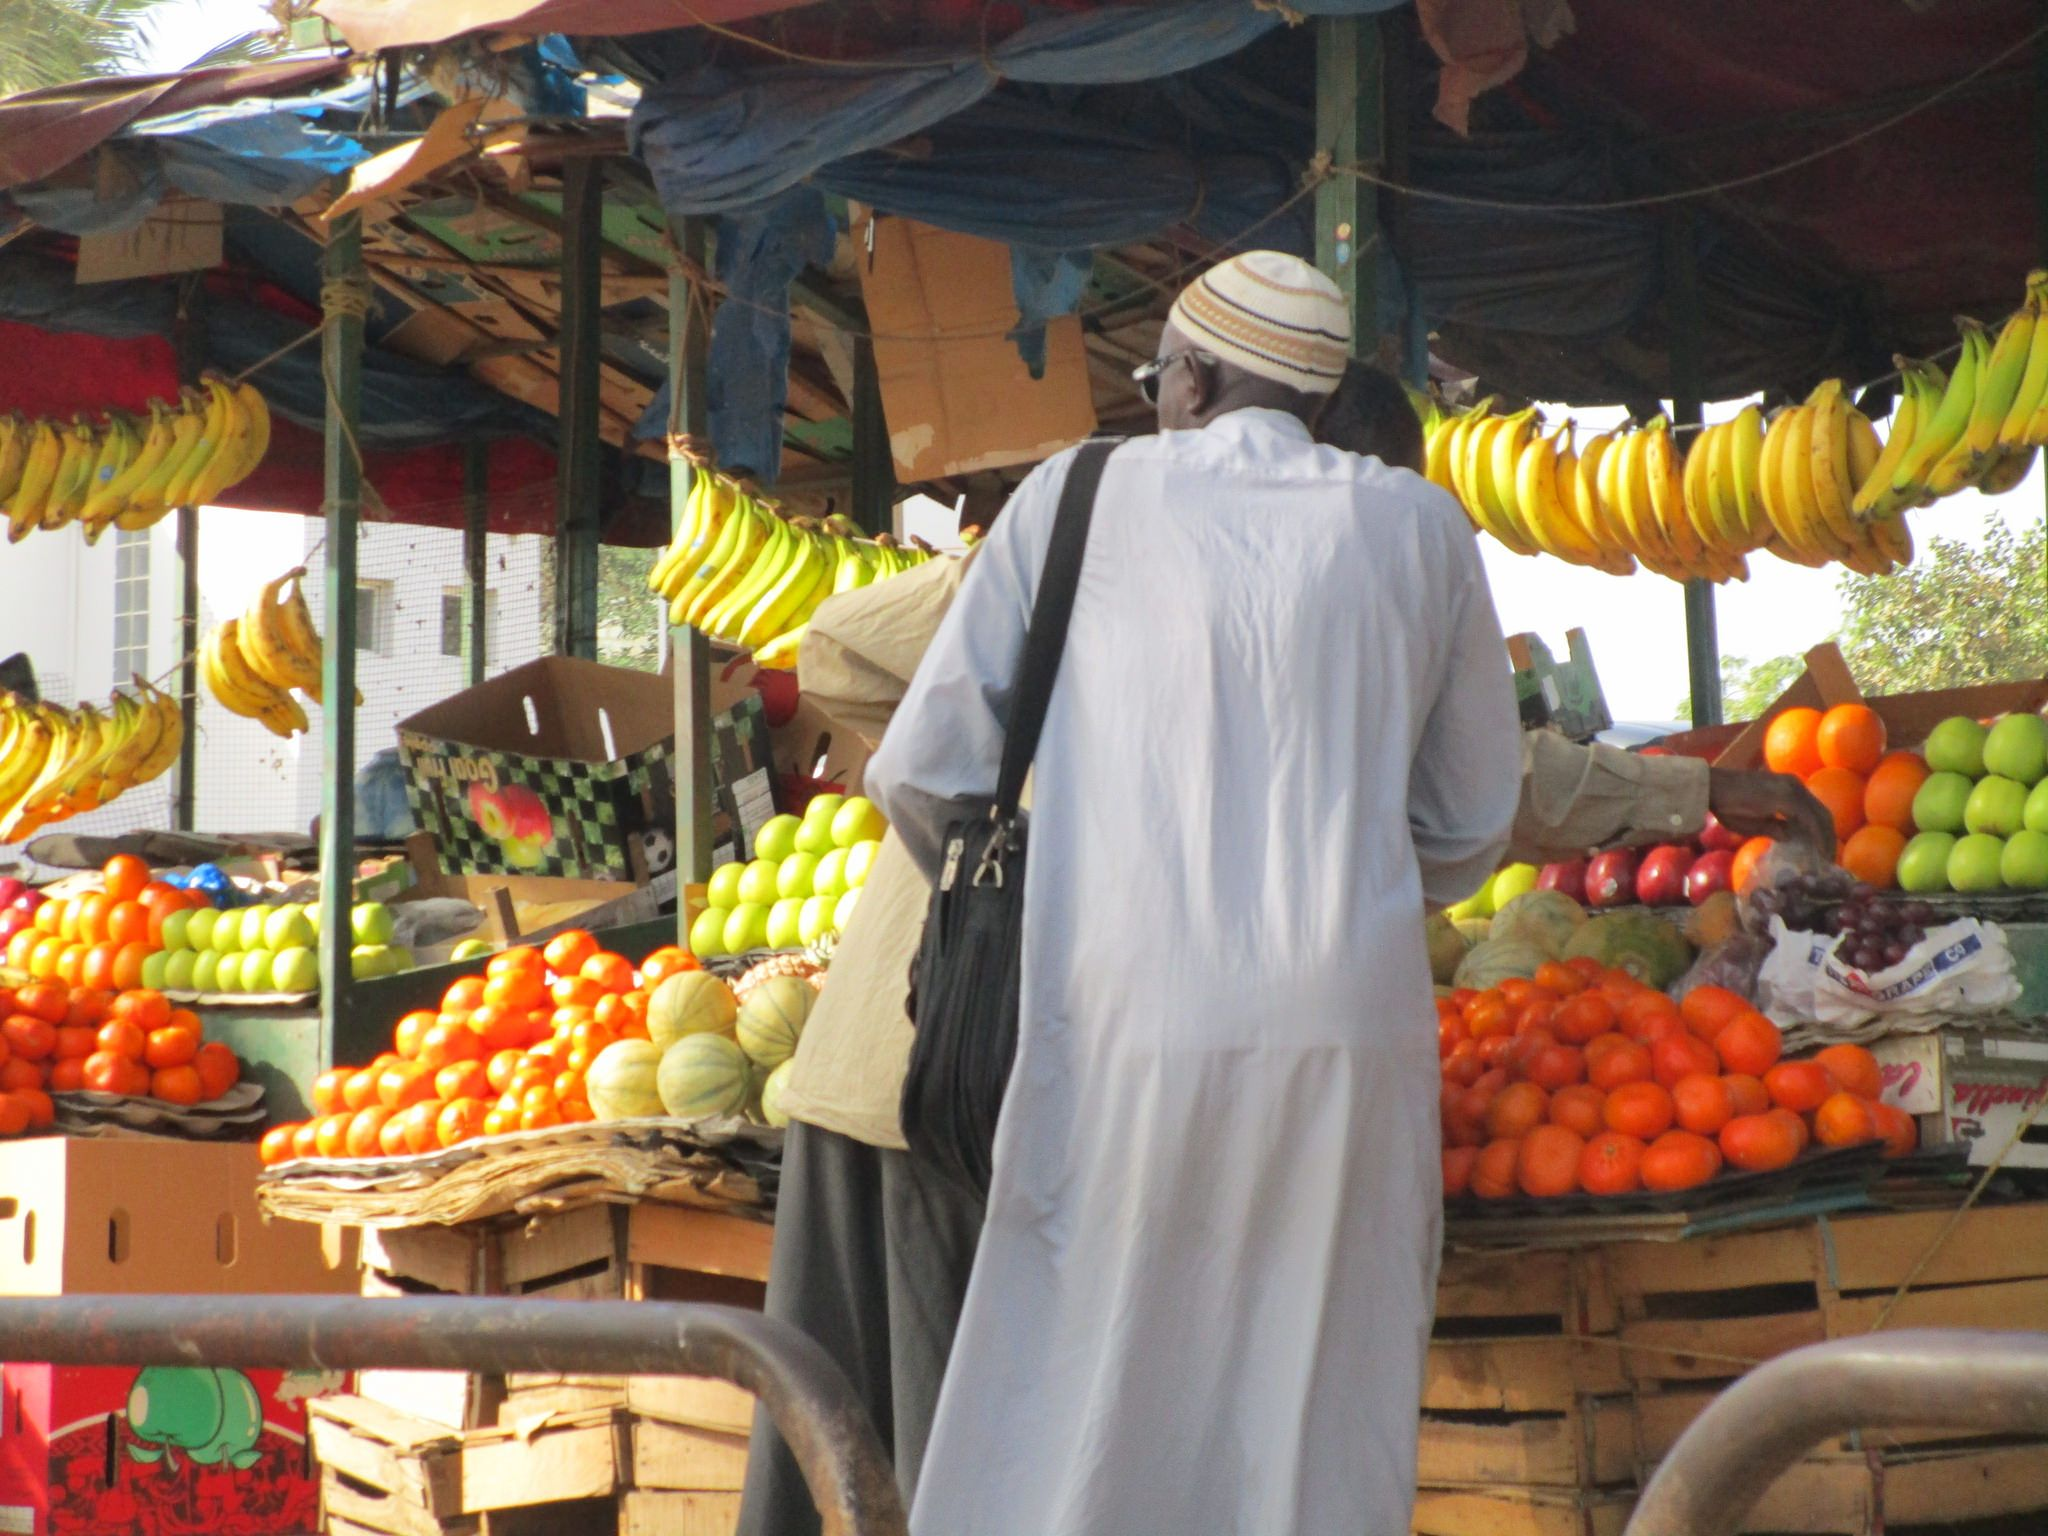 https://flic.kr/p/JtNdhj | 20160329 (5) - kopie | Senegal Afrika